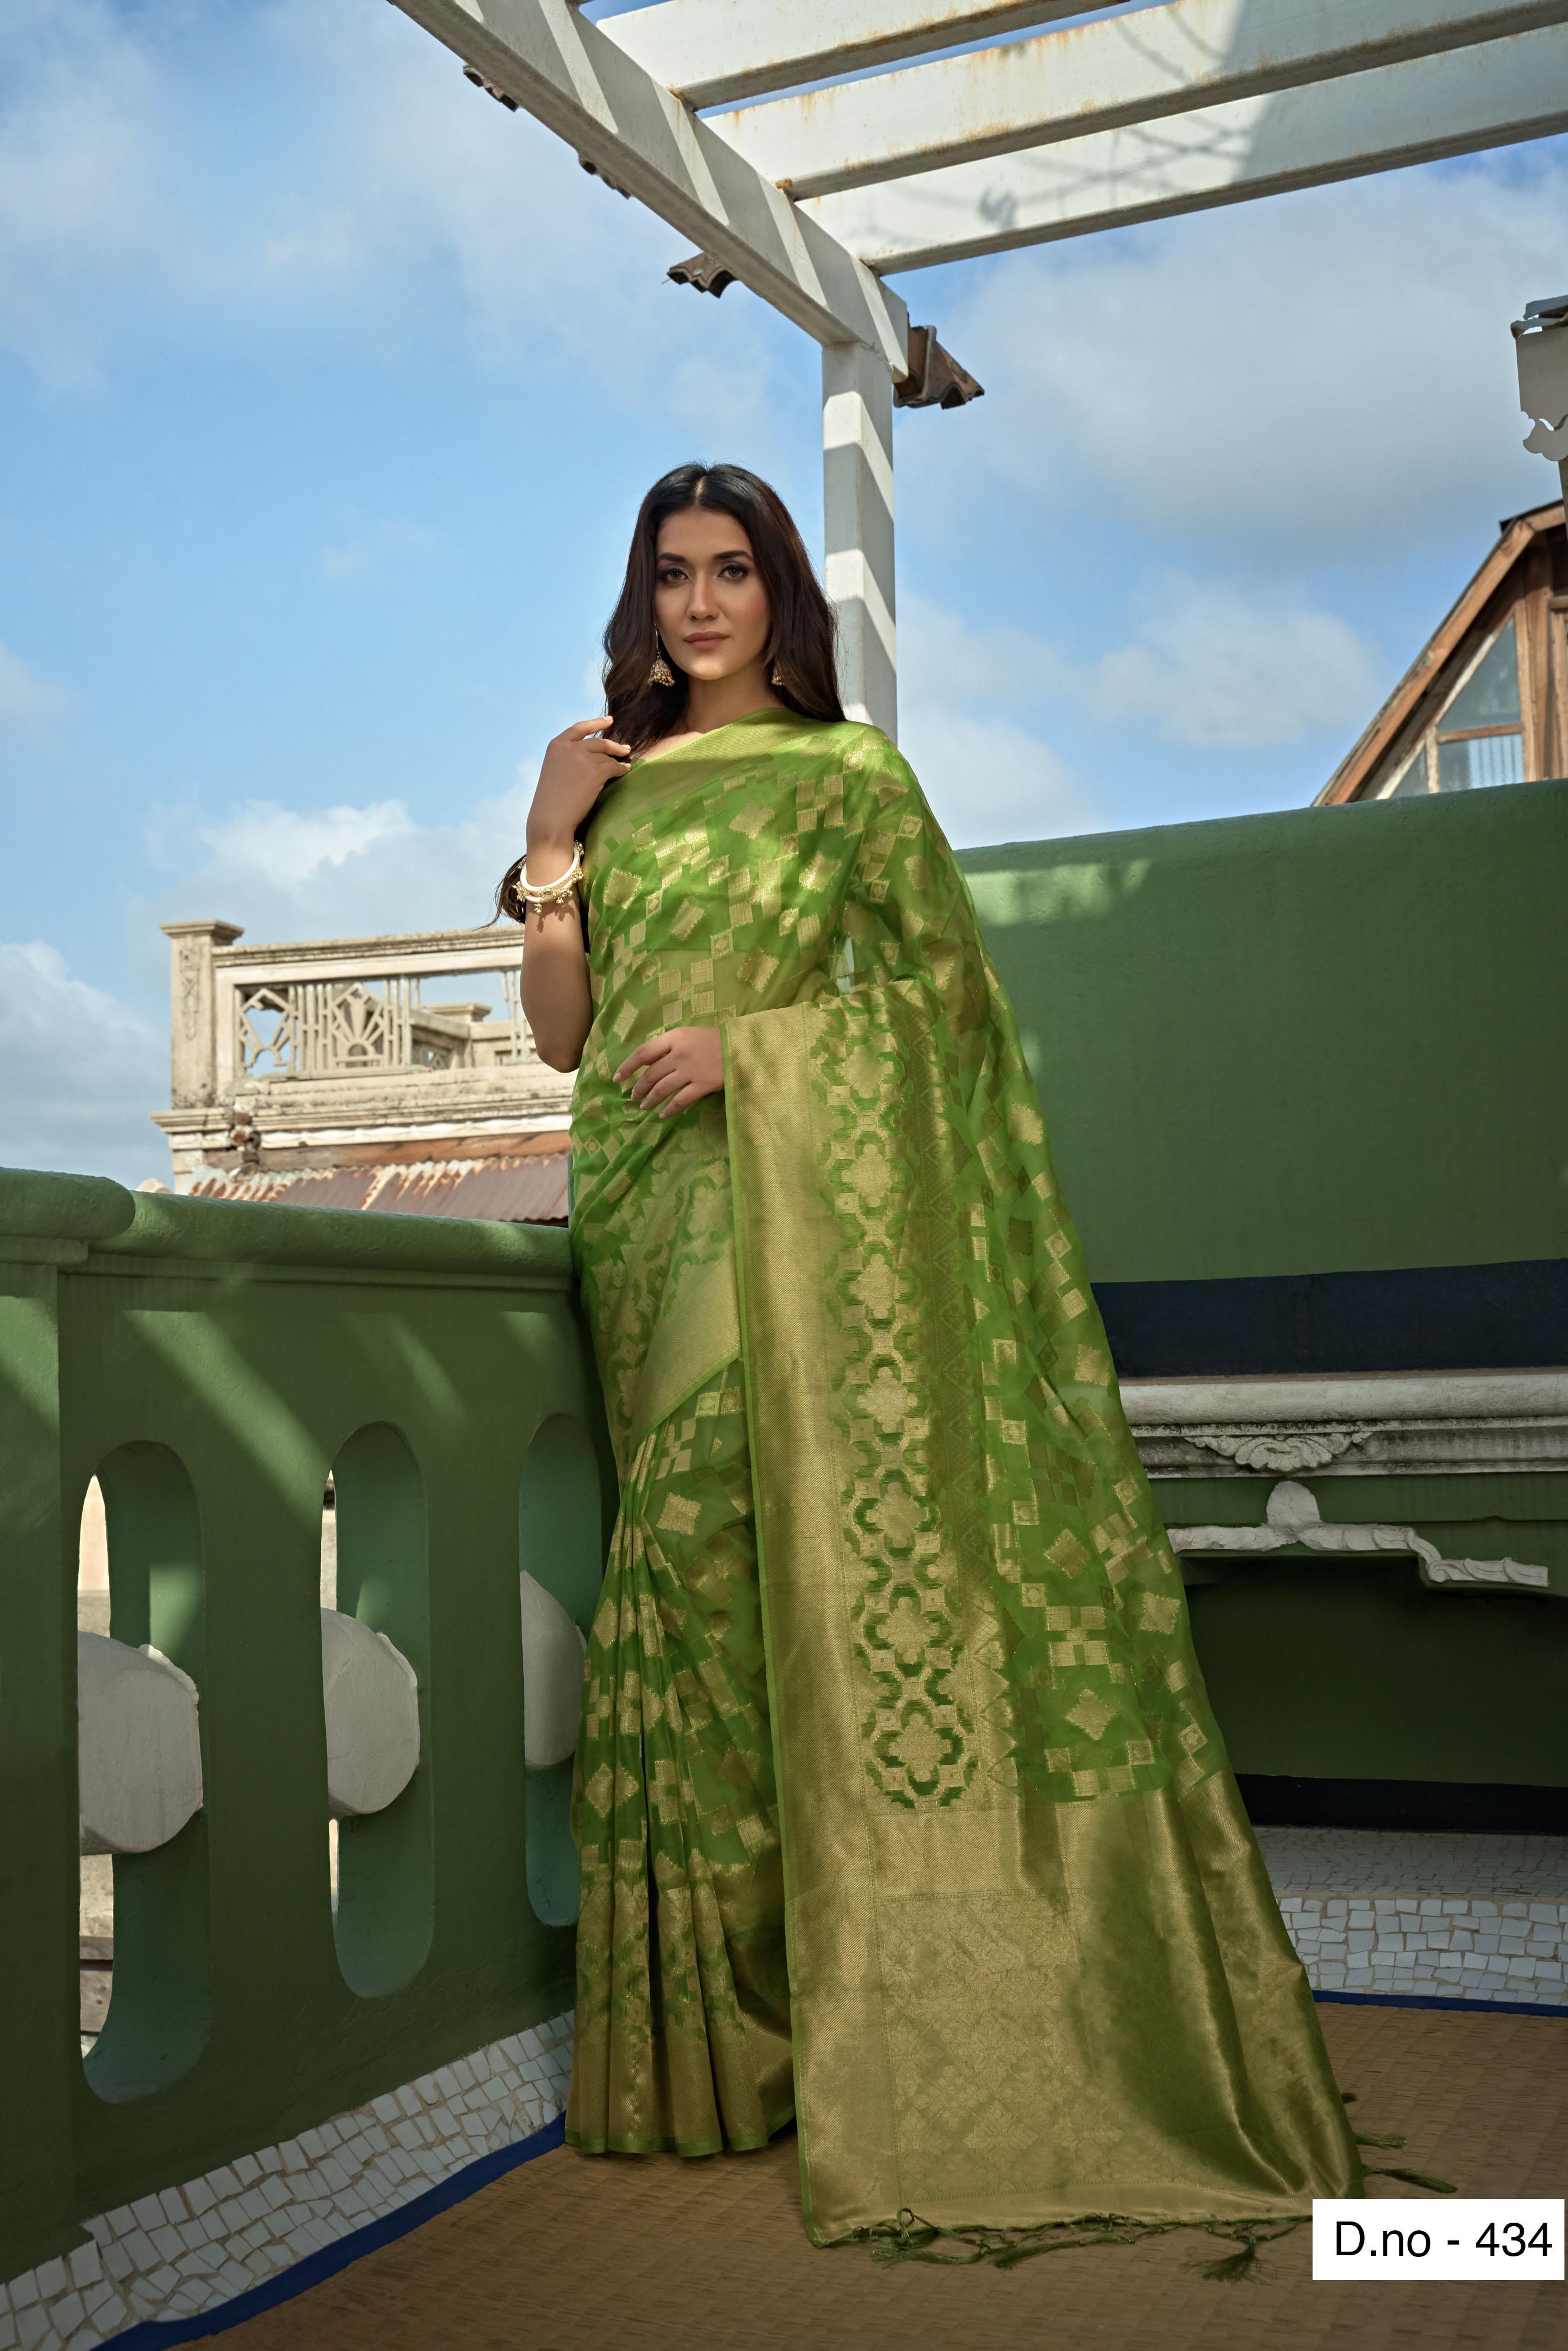 POONAM TEXTILE | Fashion Banaras Light Green Organza Silk Hand Dyed Zari Festive Saree